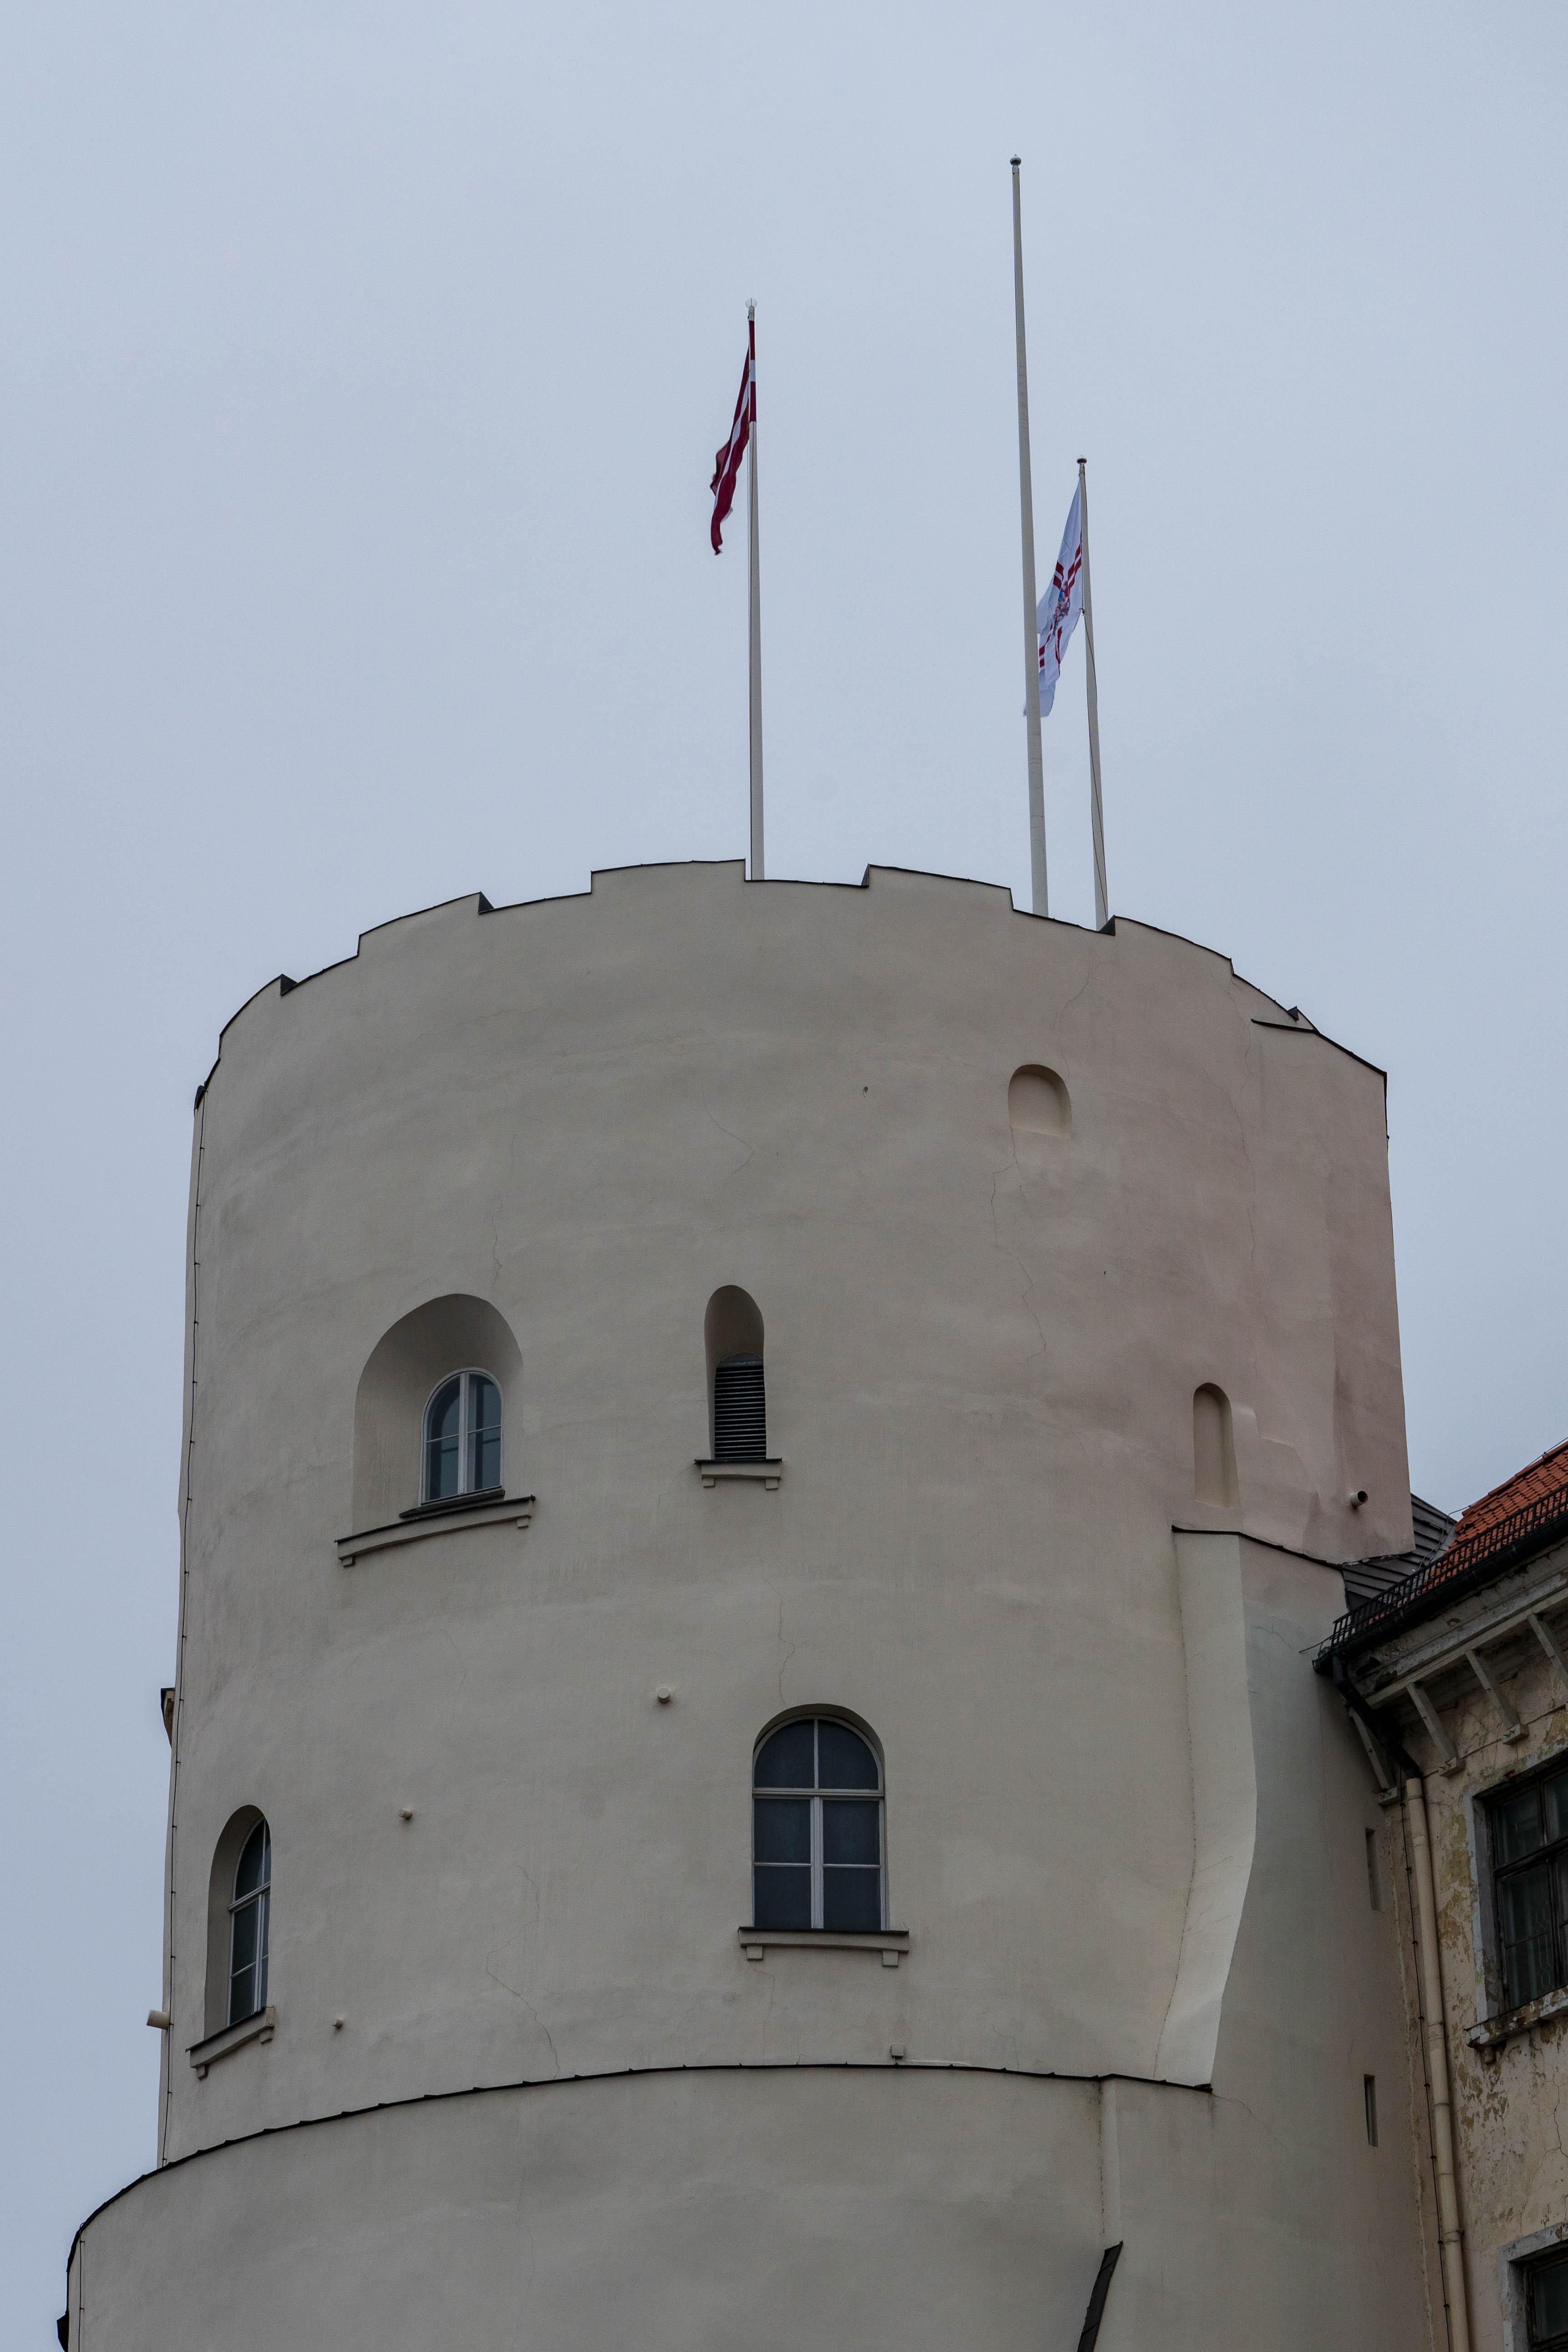 Chateau Riga Tour Visiter Lettonie Odysight Blog Voyage